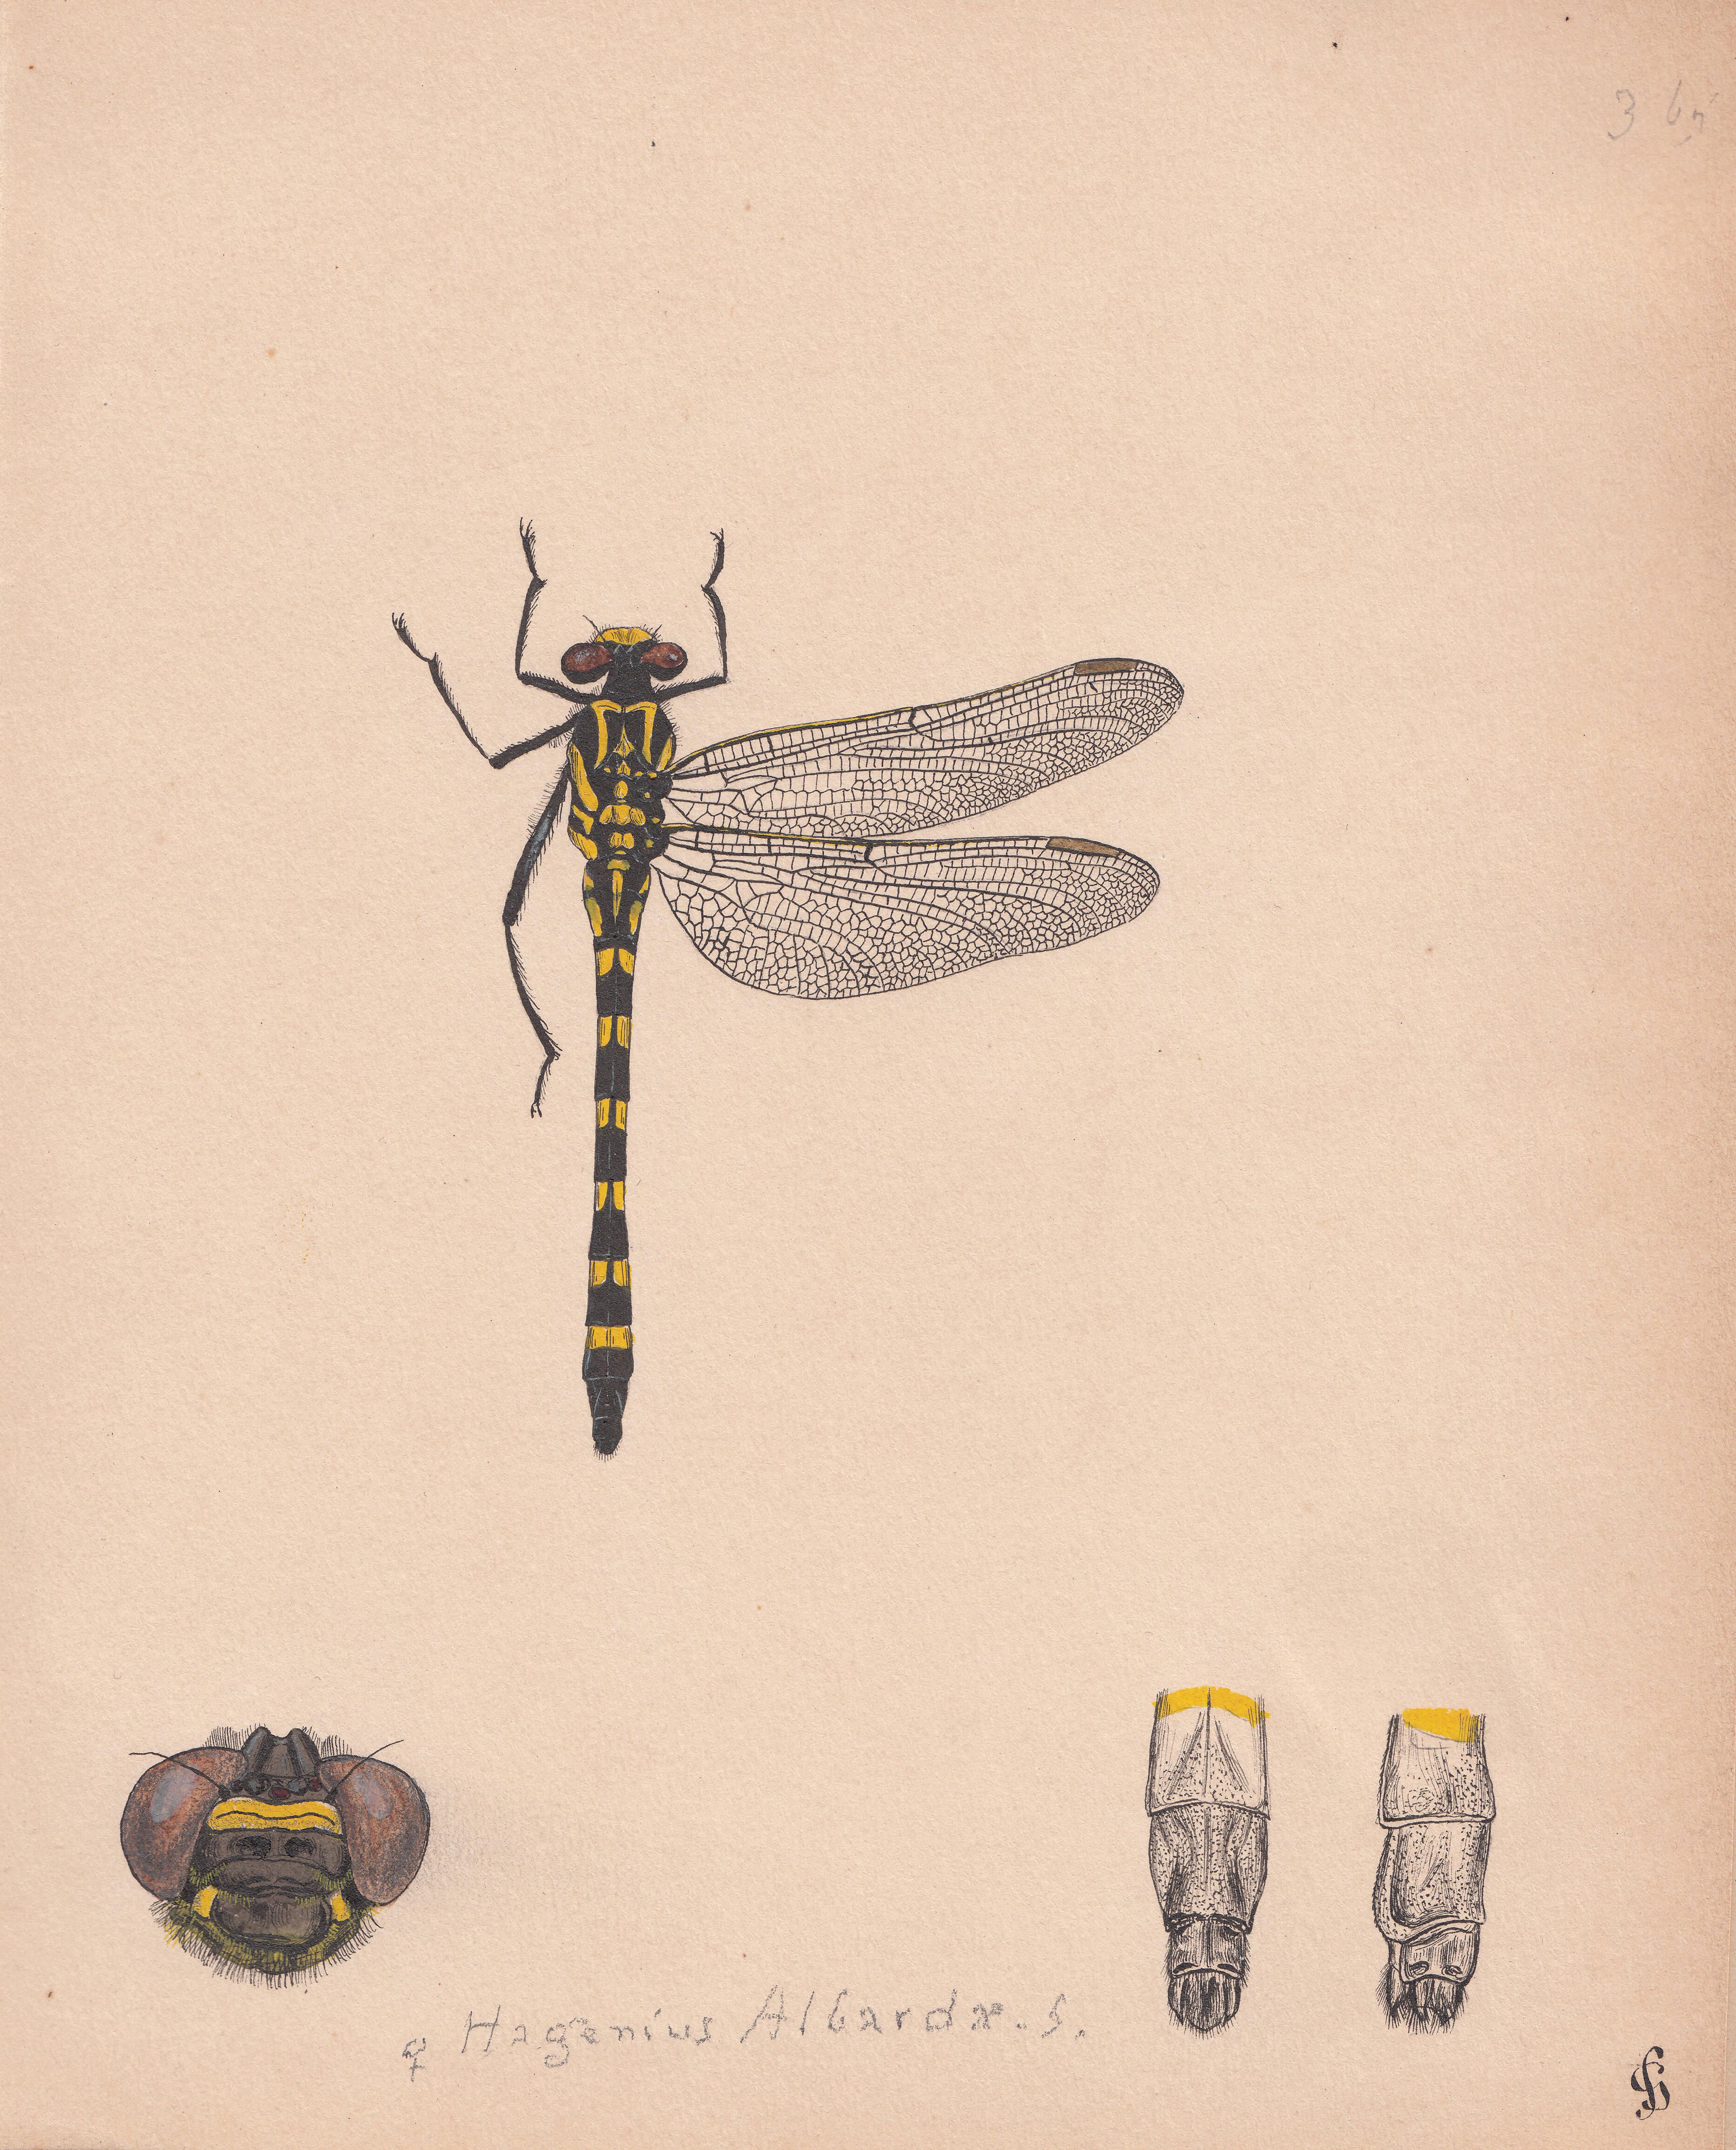 Hagenius albardae.jpg